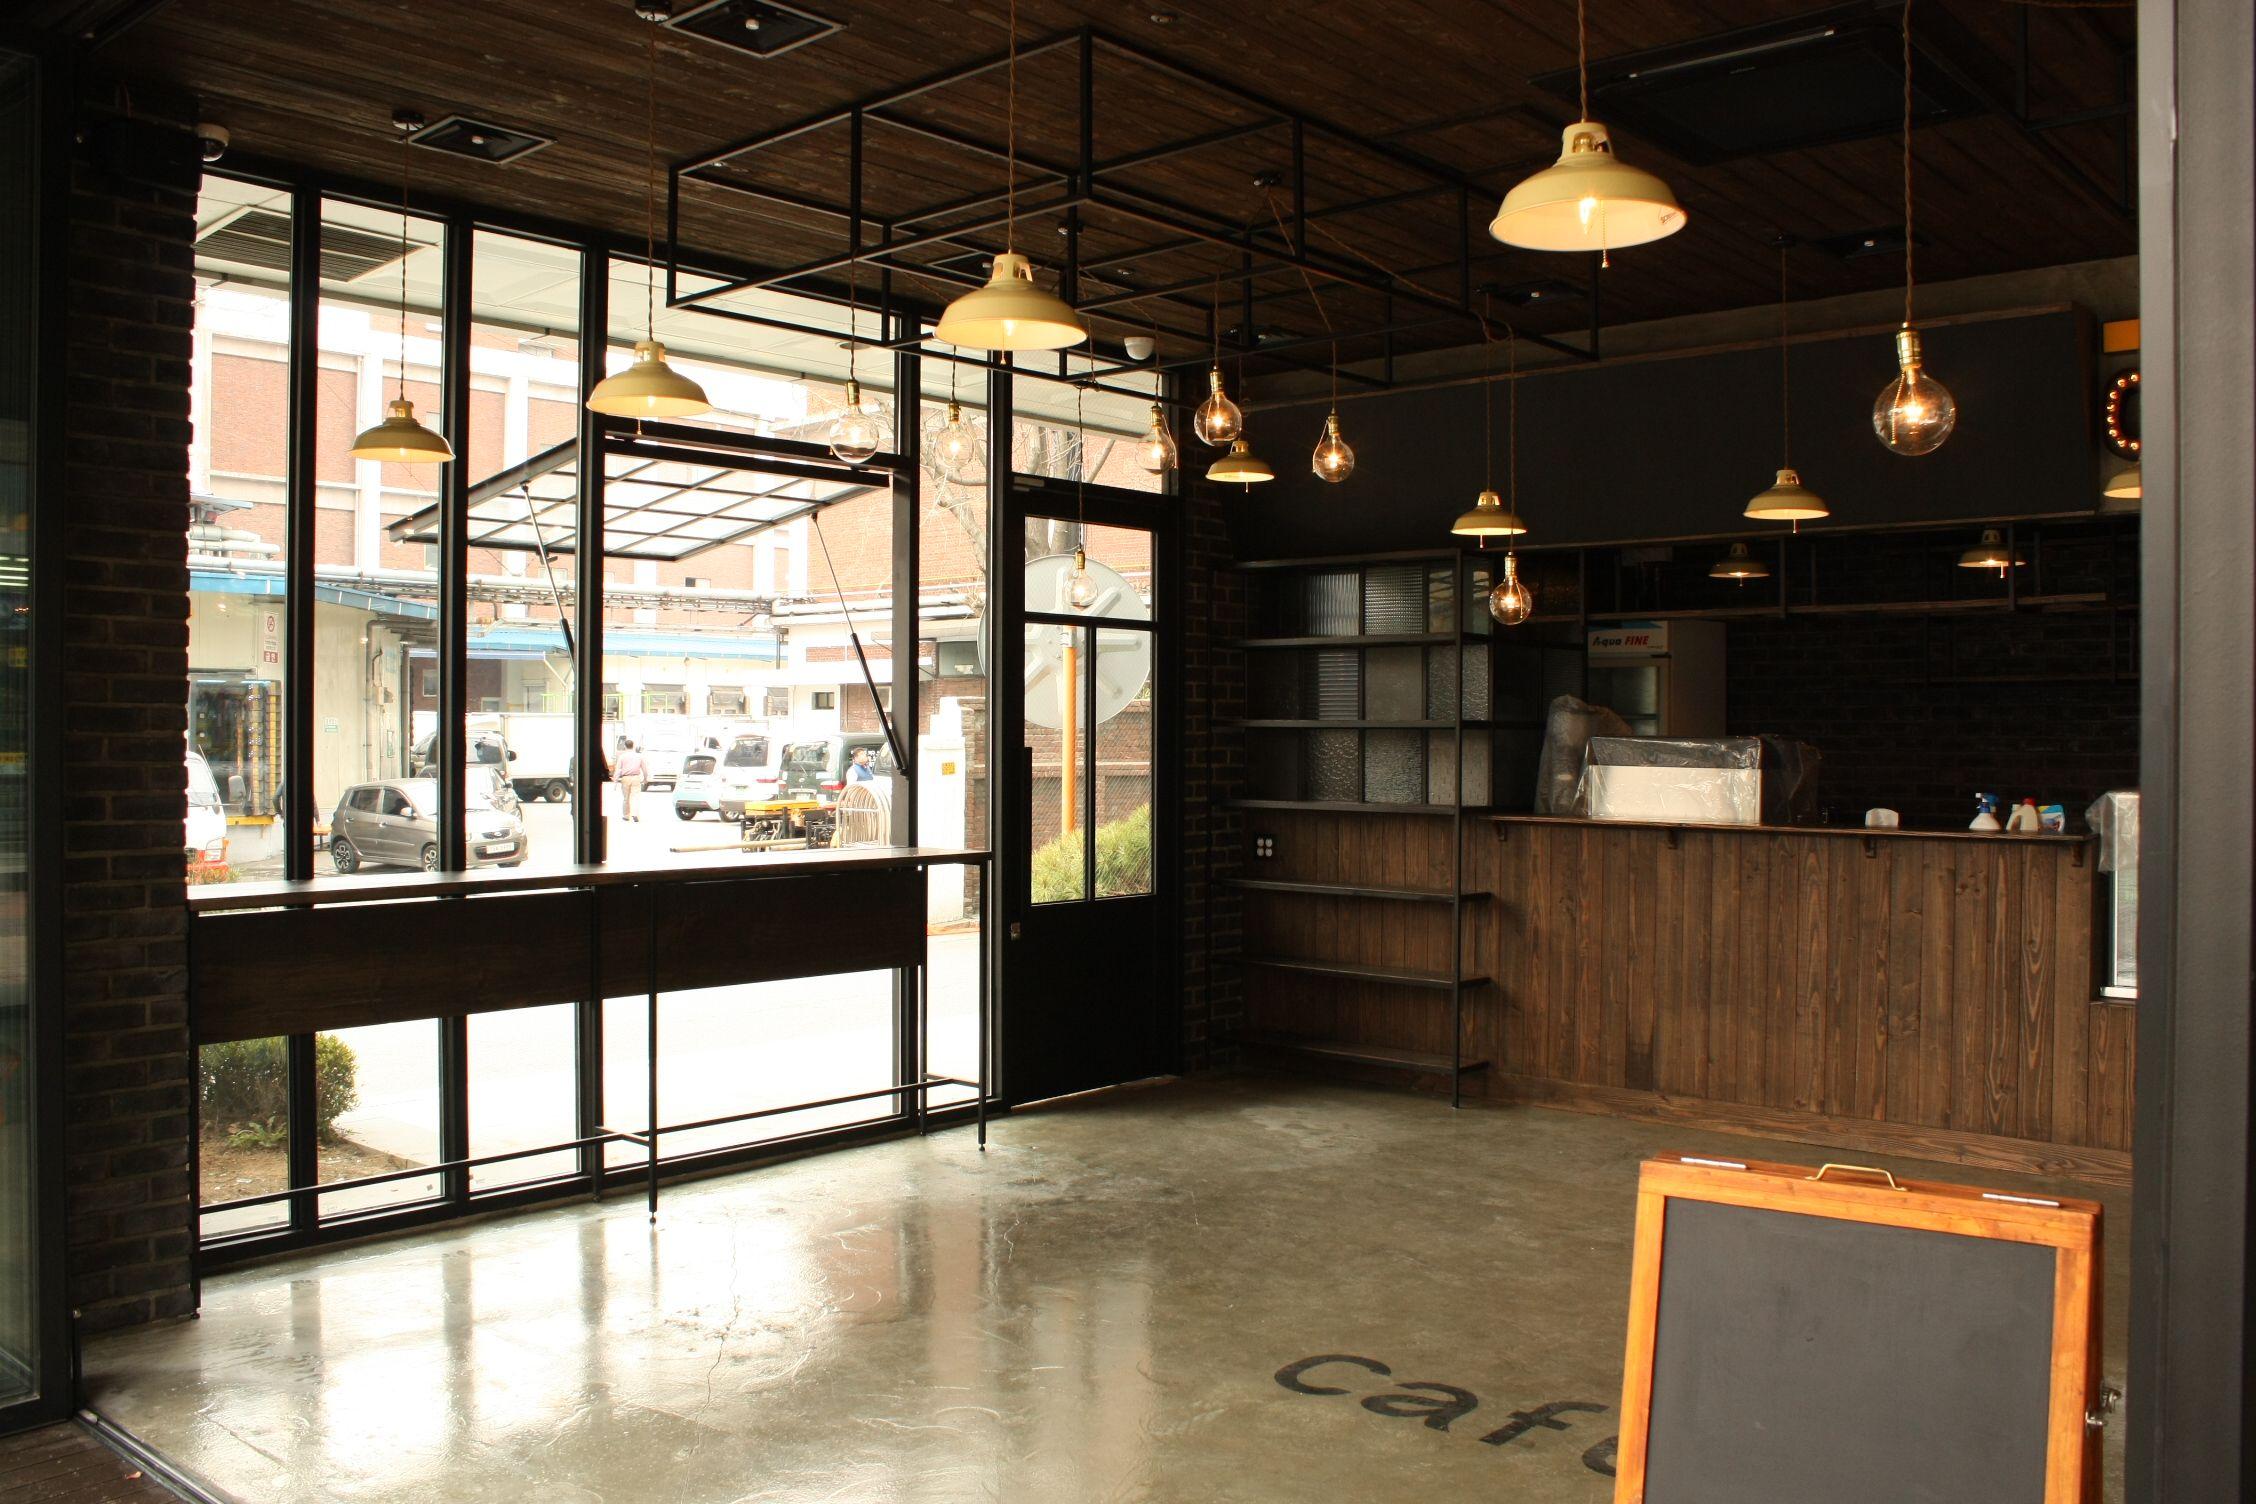 Vintage french cafe interior - Korea Vintage Cafe Interior Production Design By Screenart Http Www Byscreenart